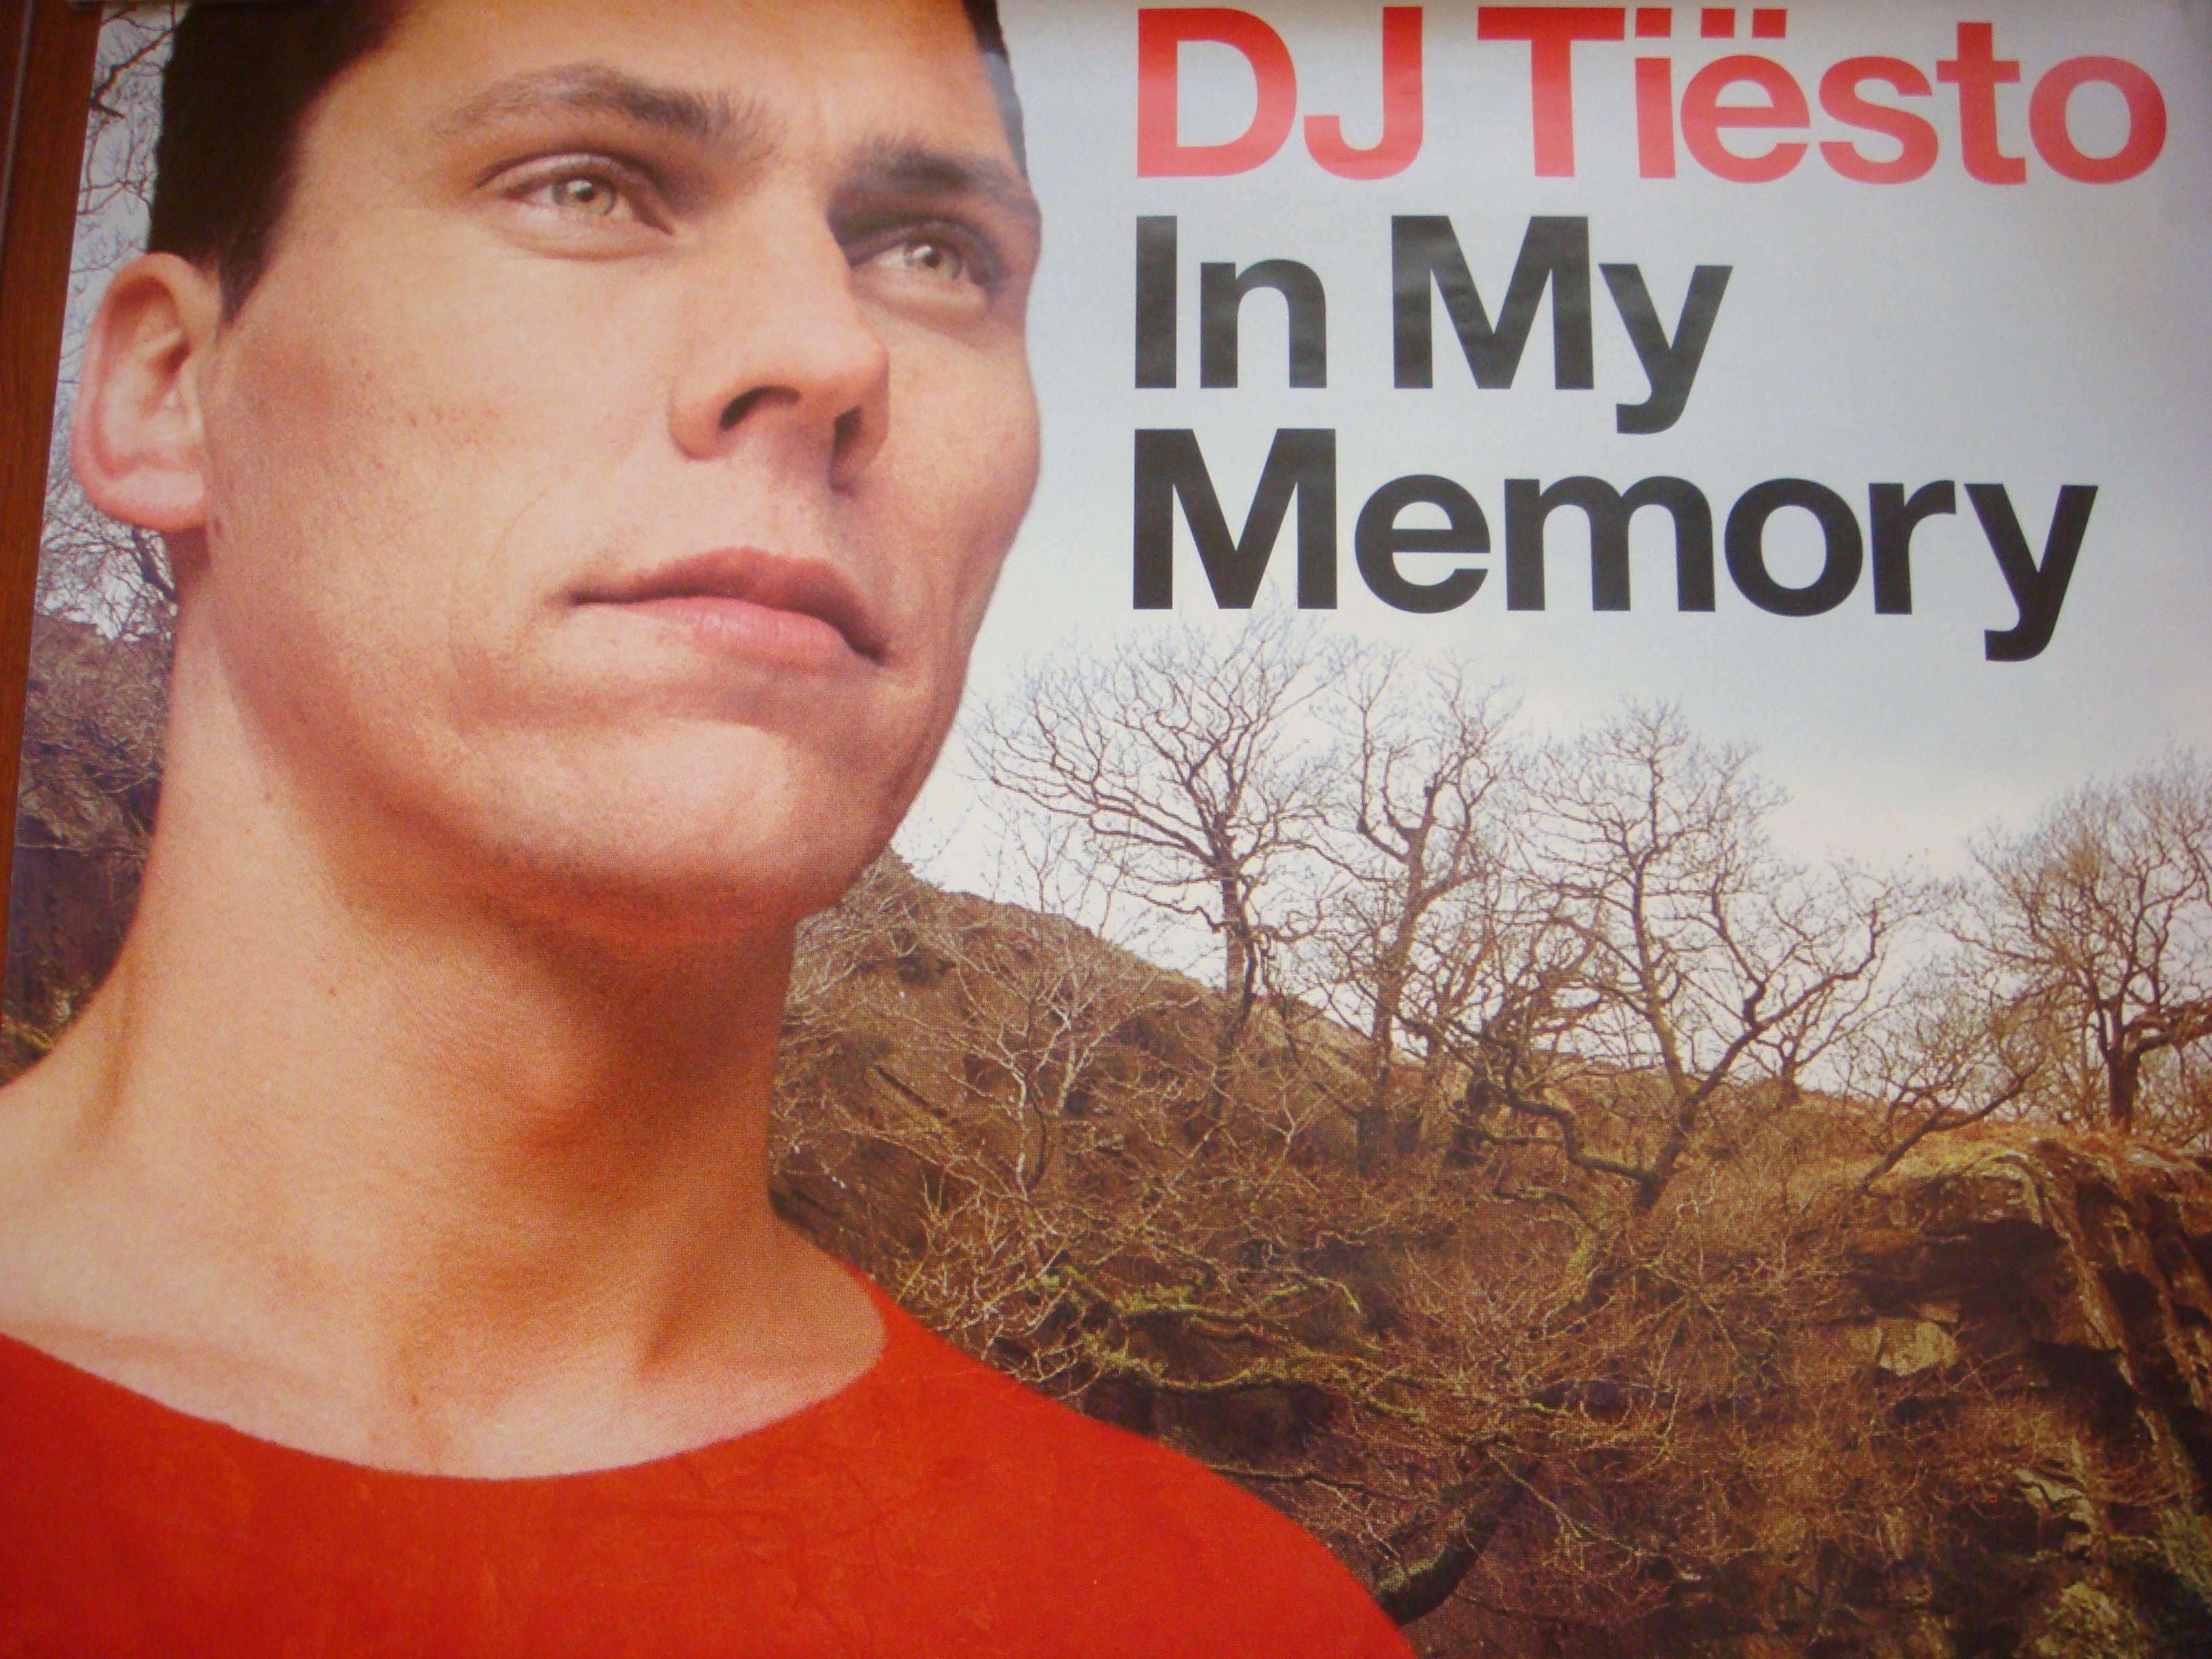 Dj Tiesto In My Memory UK Release Poster